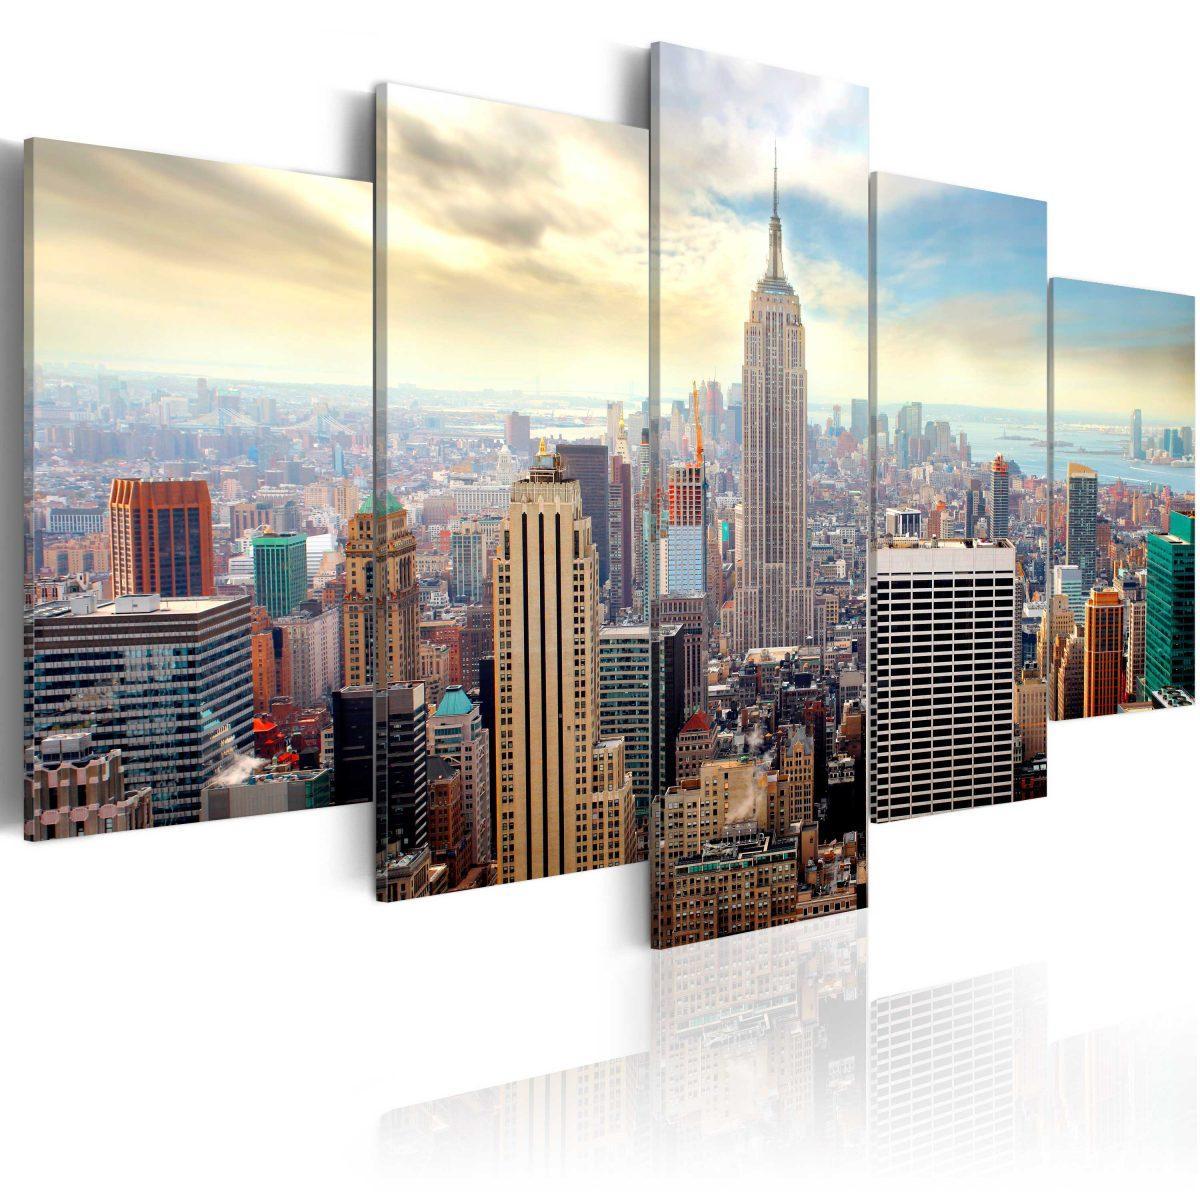 Canvas Tavla - Morning in New York City - 200x100